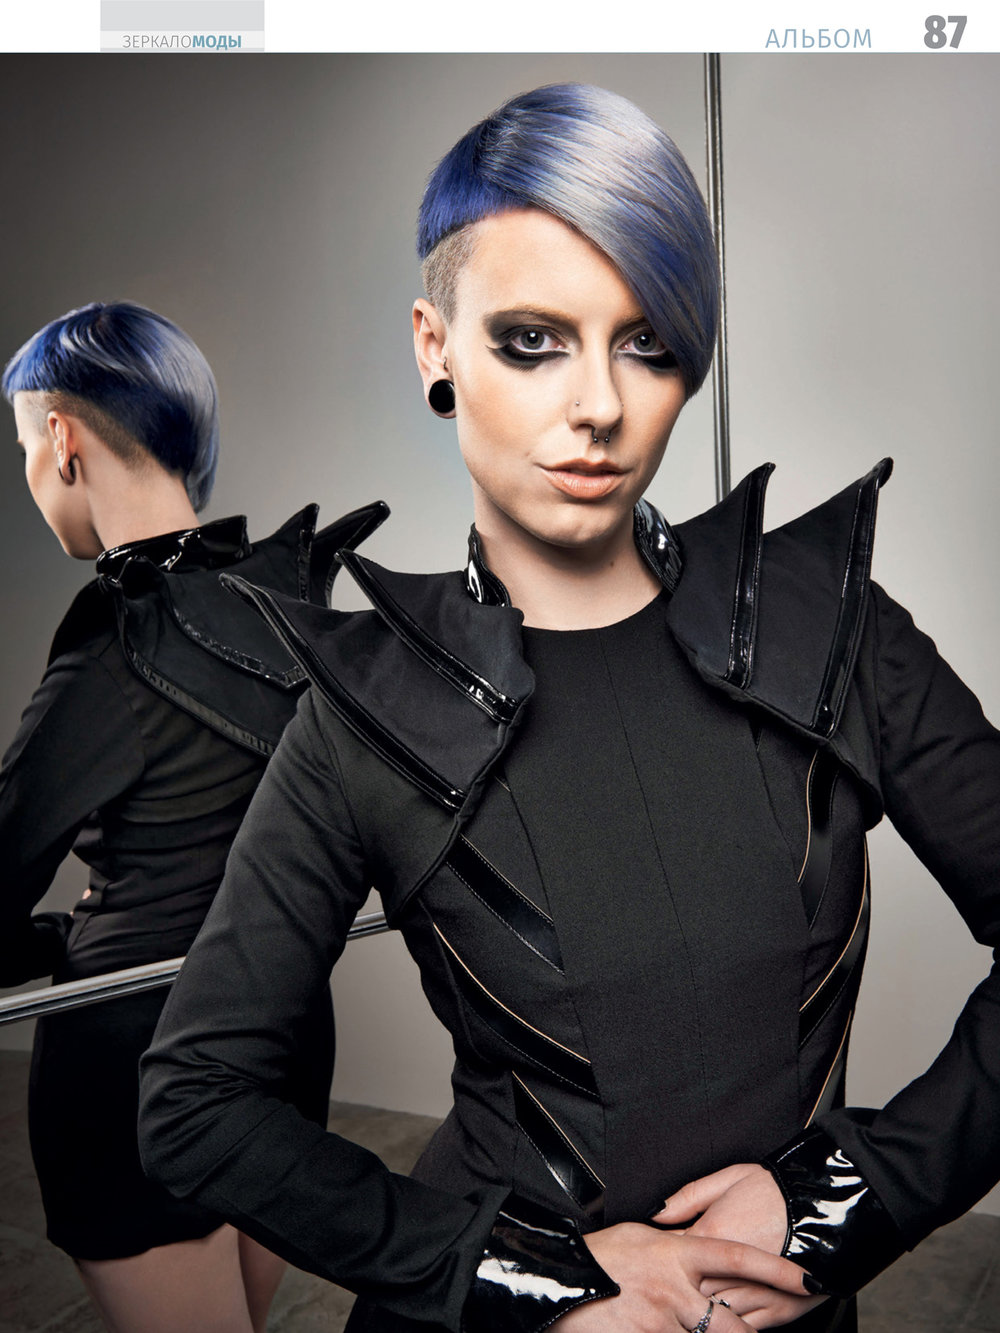 yoshikohair_stkilda_melbourne_hairdresser_hairsalon_zm17_2